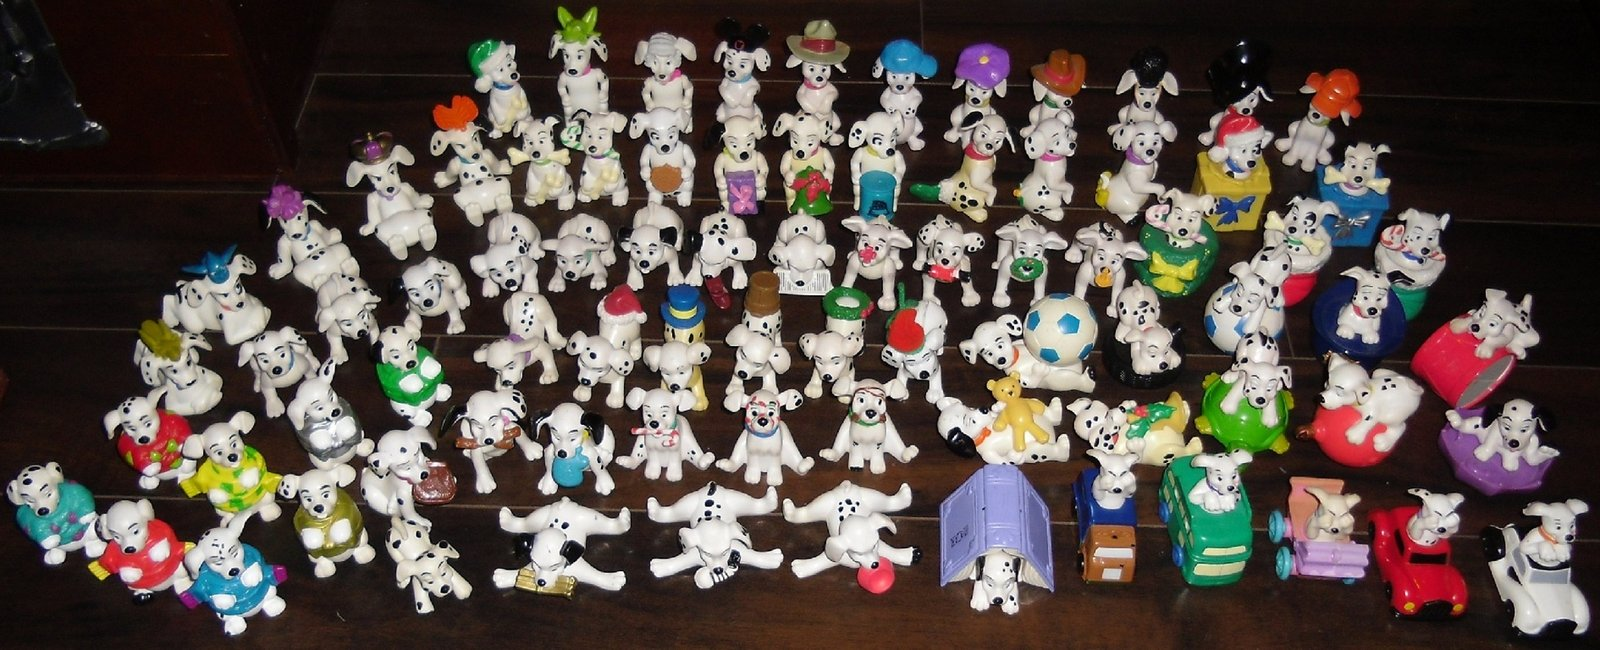 dalmatian_figures